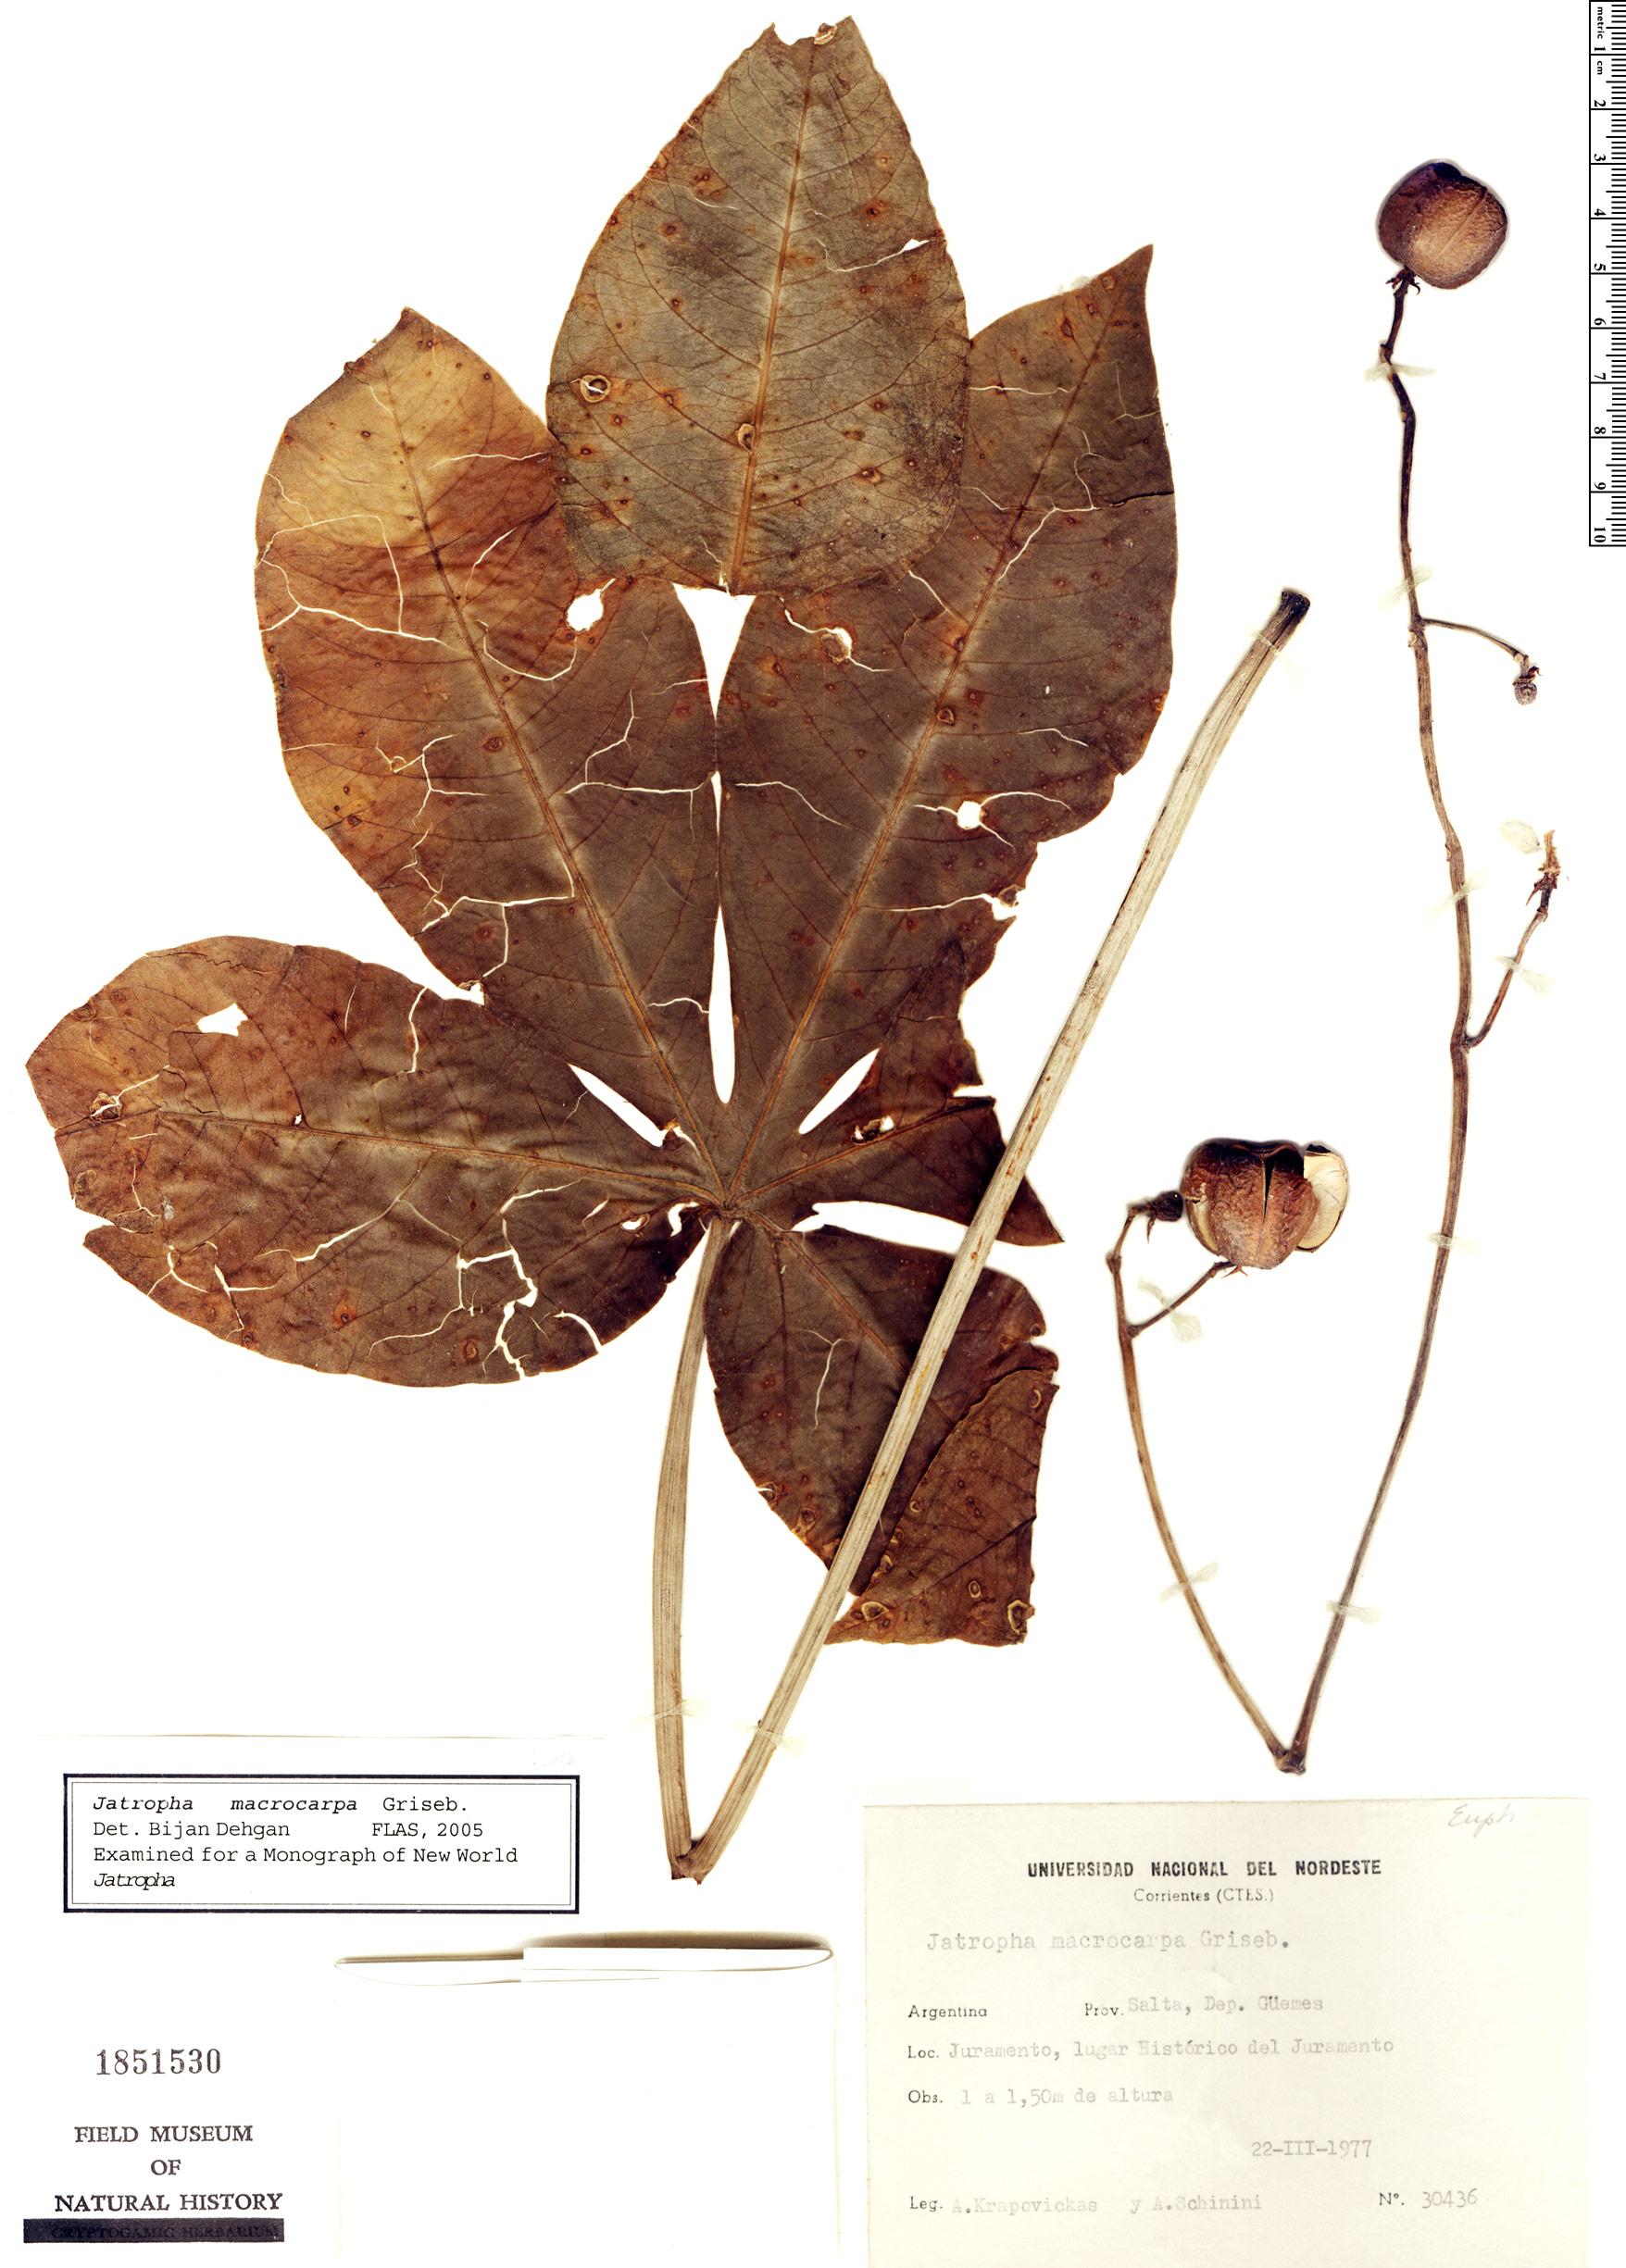 Specimen: Jatropha macrocarpa